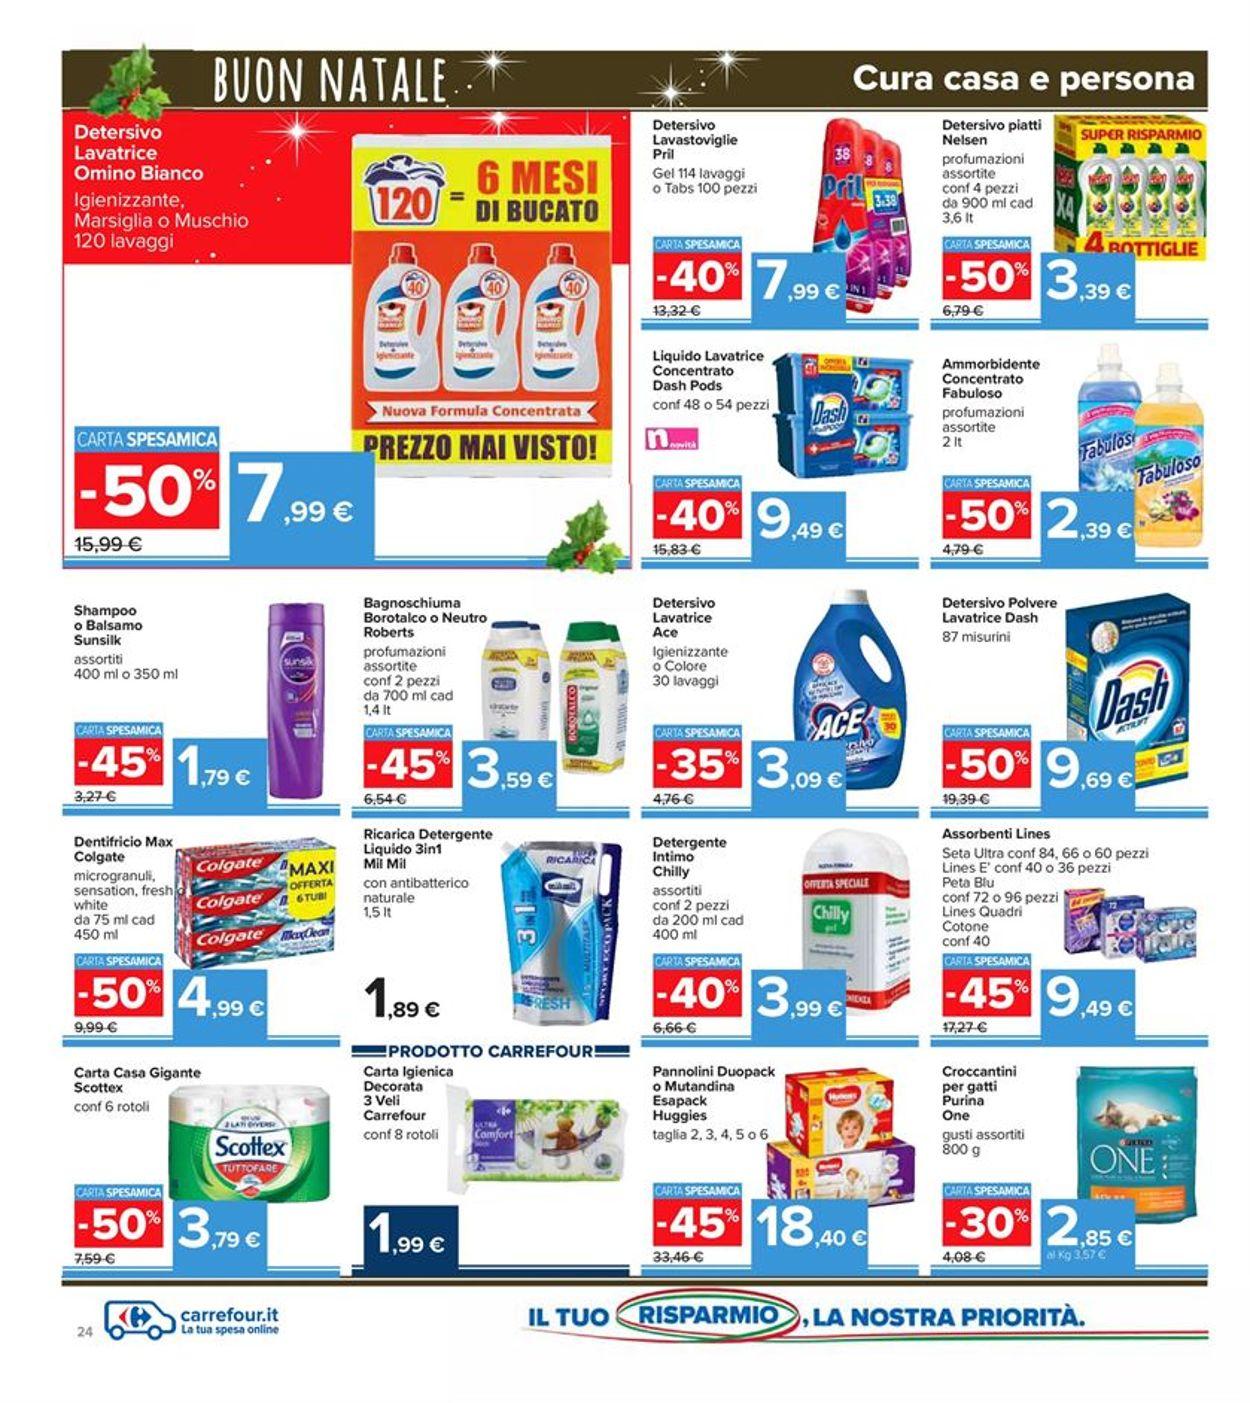 Volantino Carrefour - Natale 2020 - Offerte 14/12-27/12/2020 (Pagina 24)